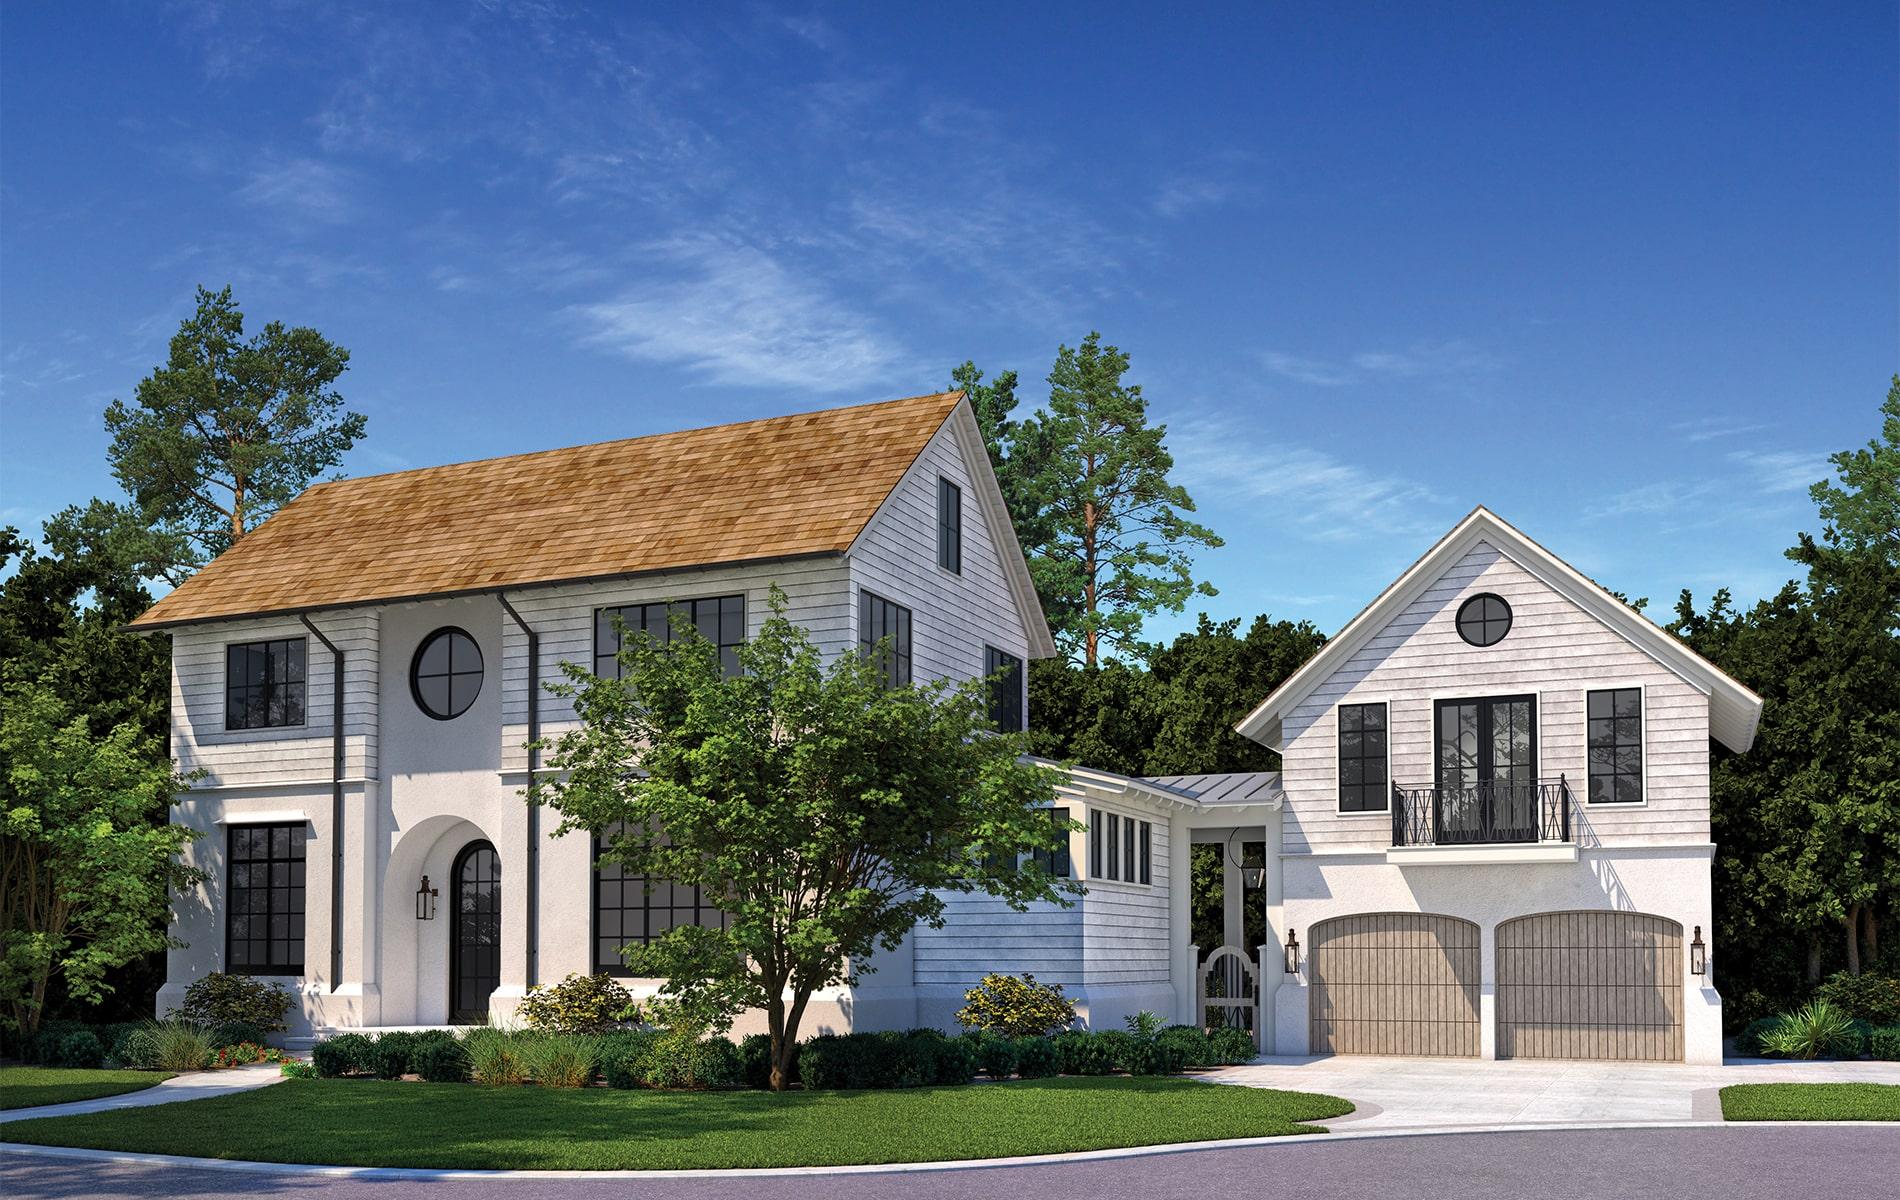 VIE Beach House, VIE Magazine, Q Tile, Coastal Elements Construction